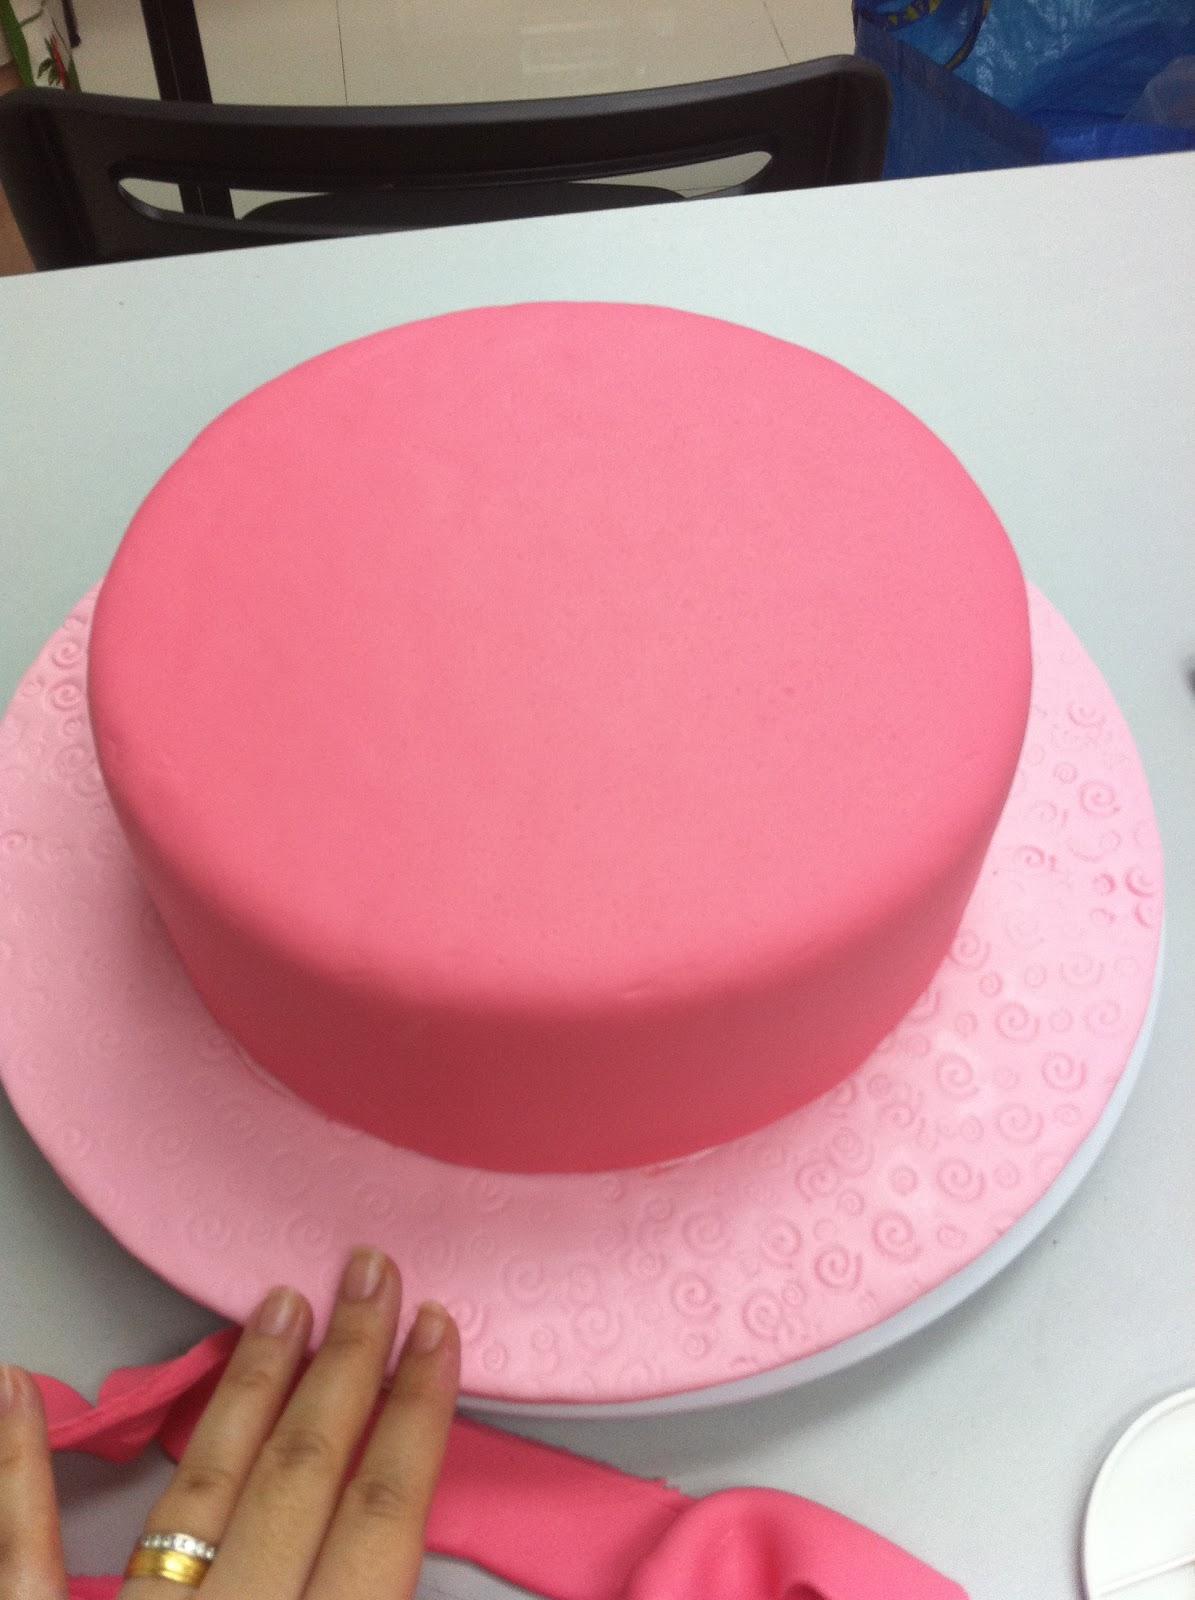 Wilton Cake Fondant Class : Home May de Cakes: Wilton Cake Decorating Course 3 : Gum ...